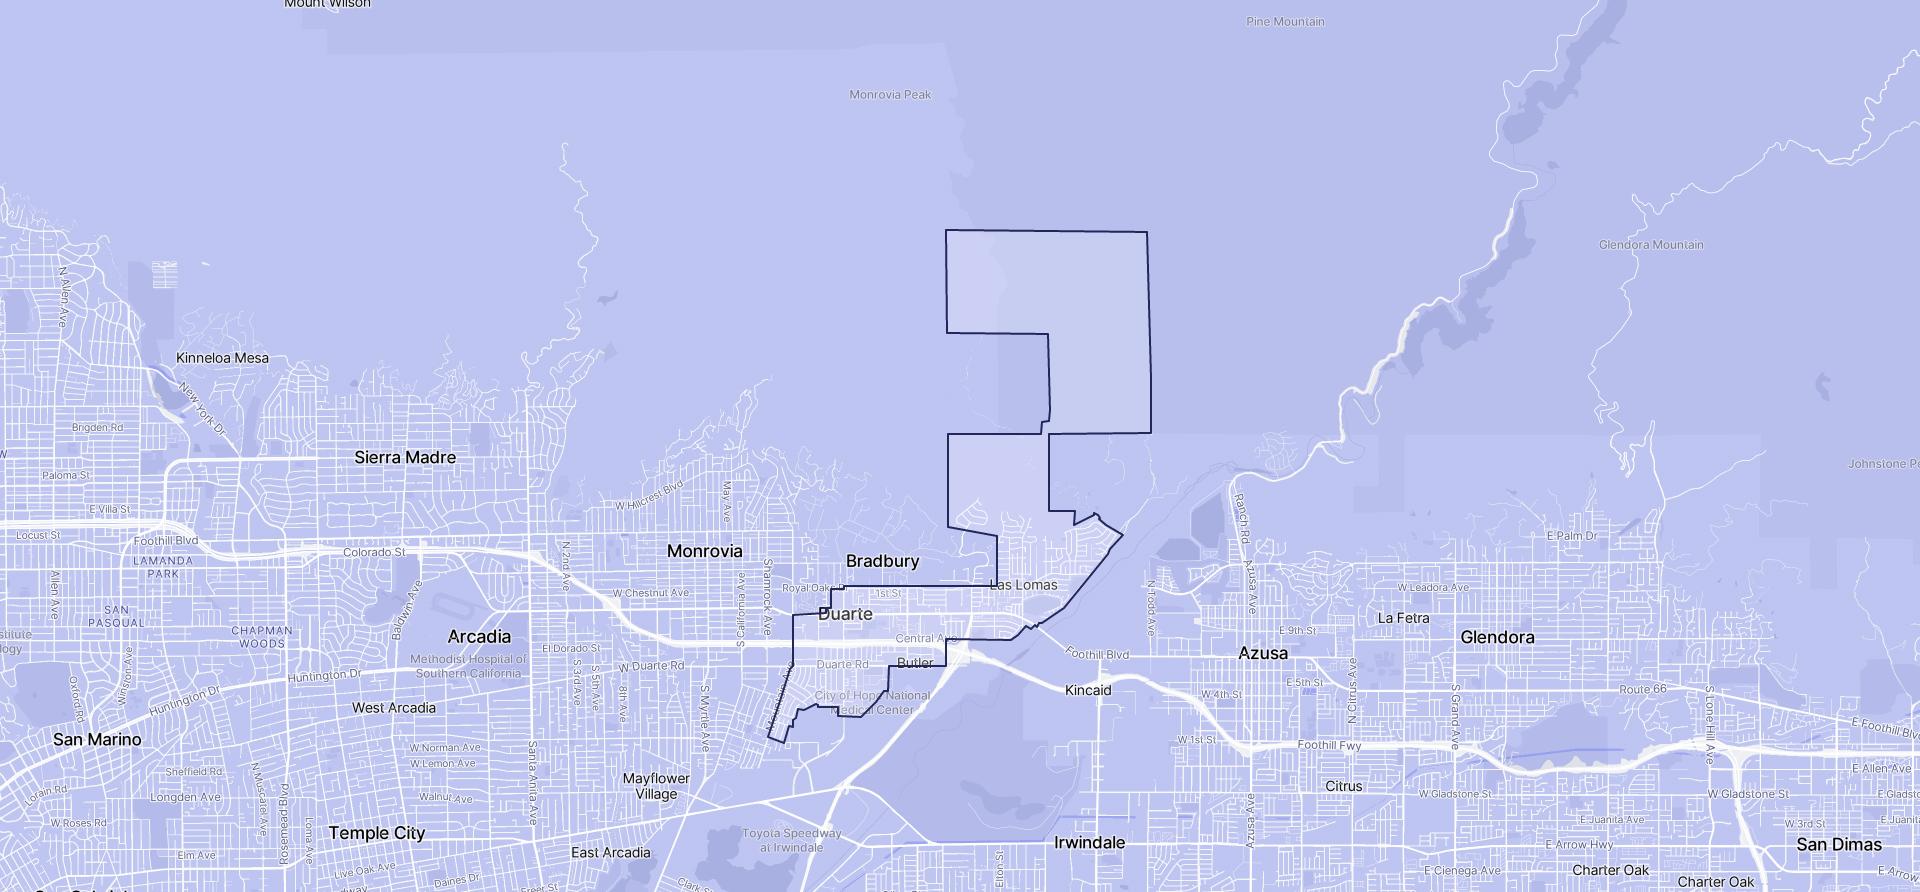 Image of Duarte boundaries on a map.